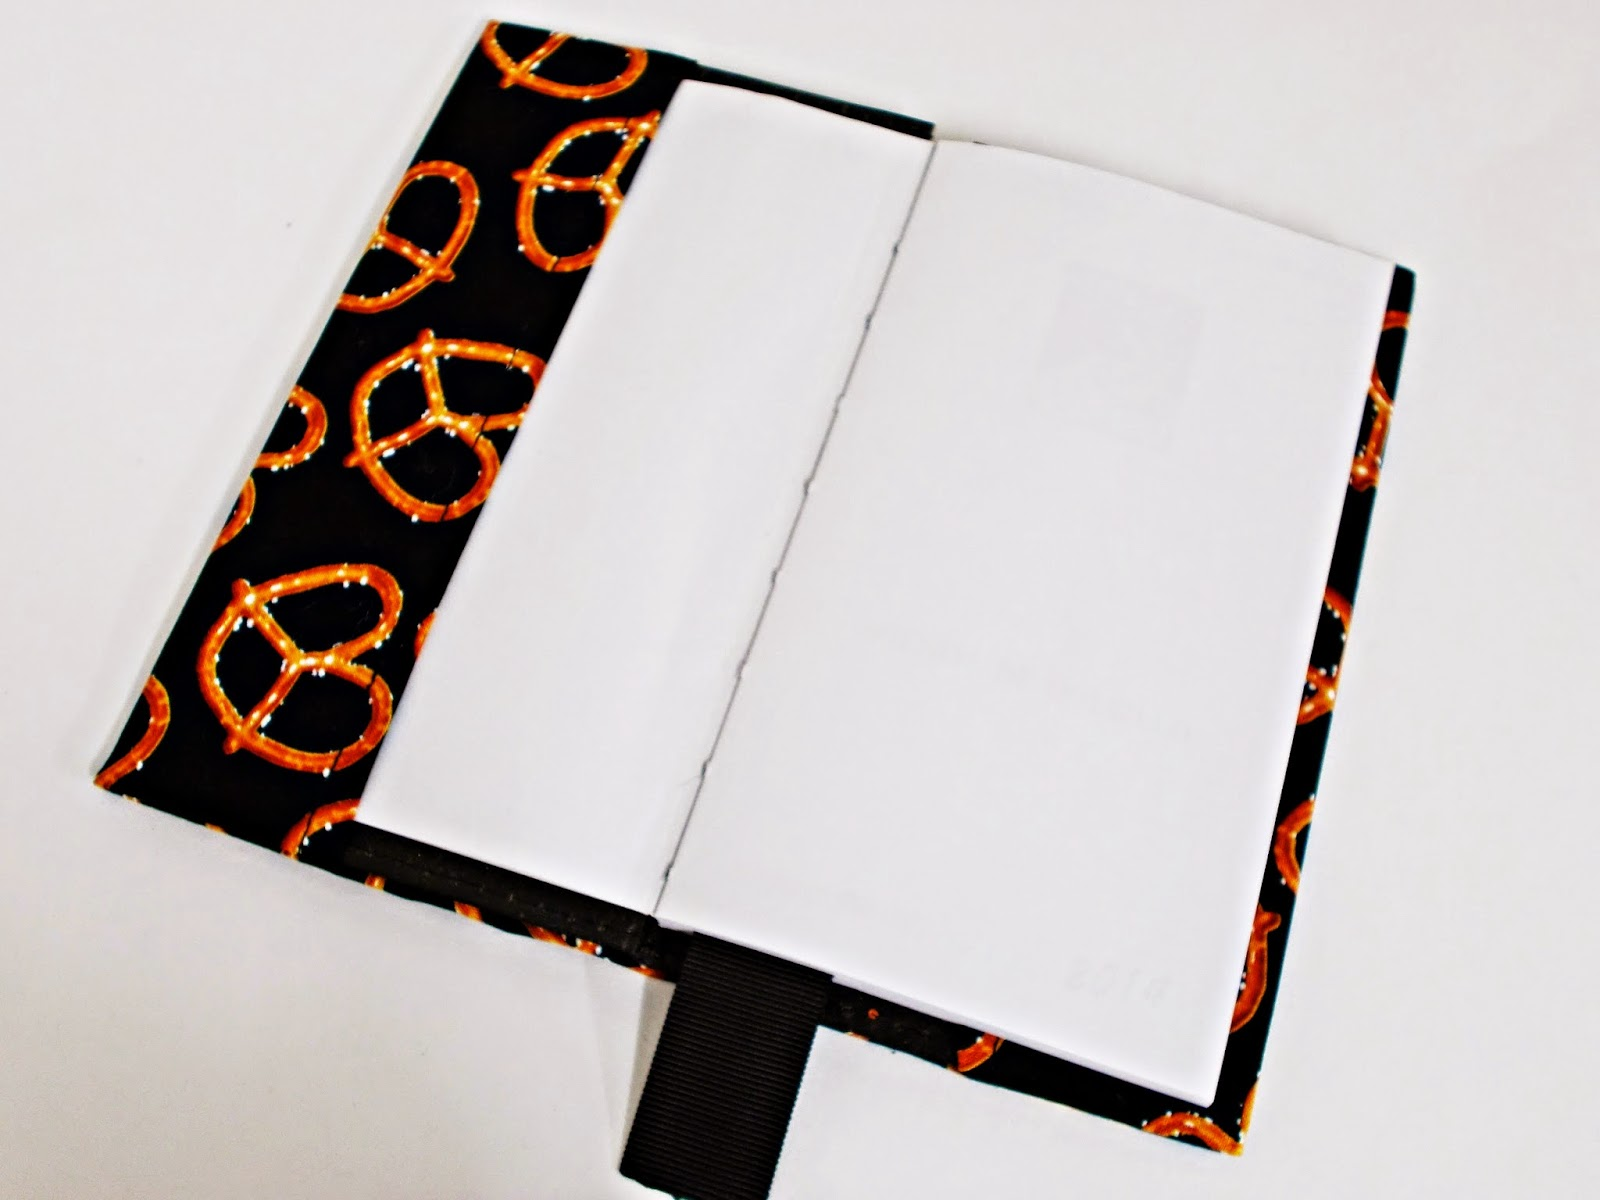 DIY-forrar-encuadernar-cuaderno-libro-libreta-agenda-tela-3